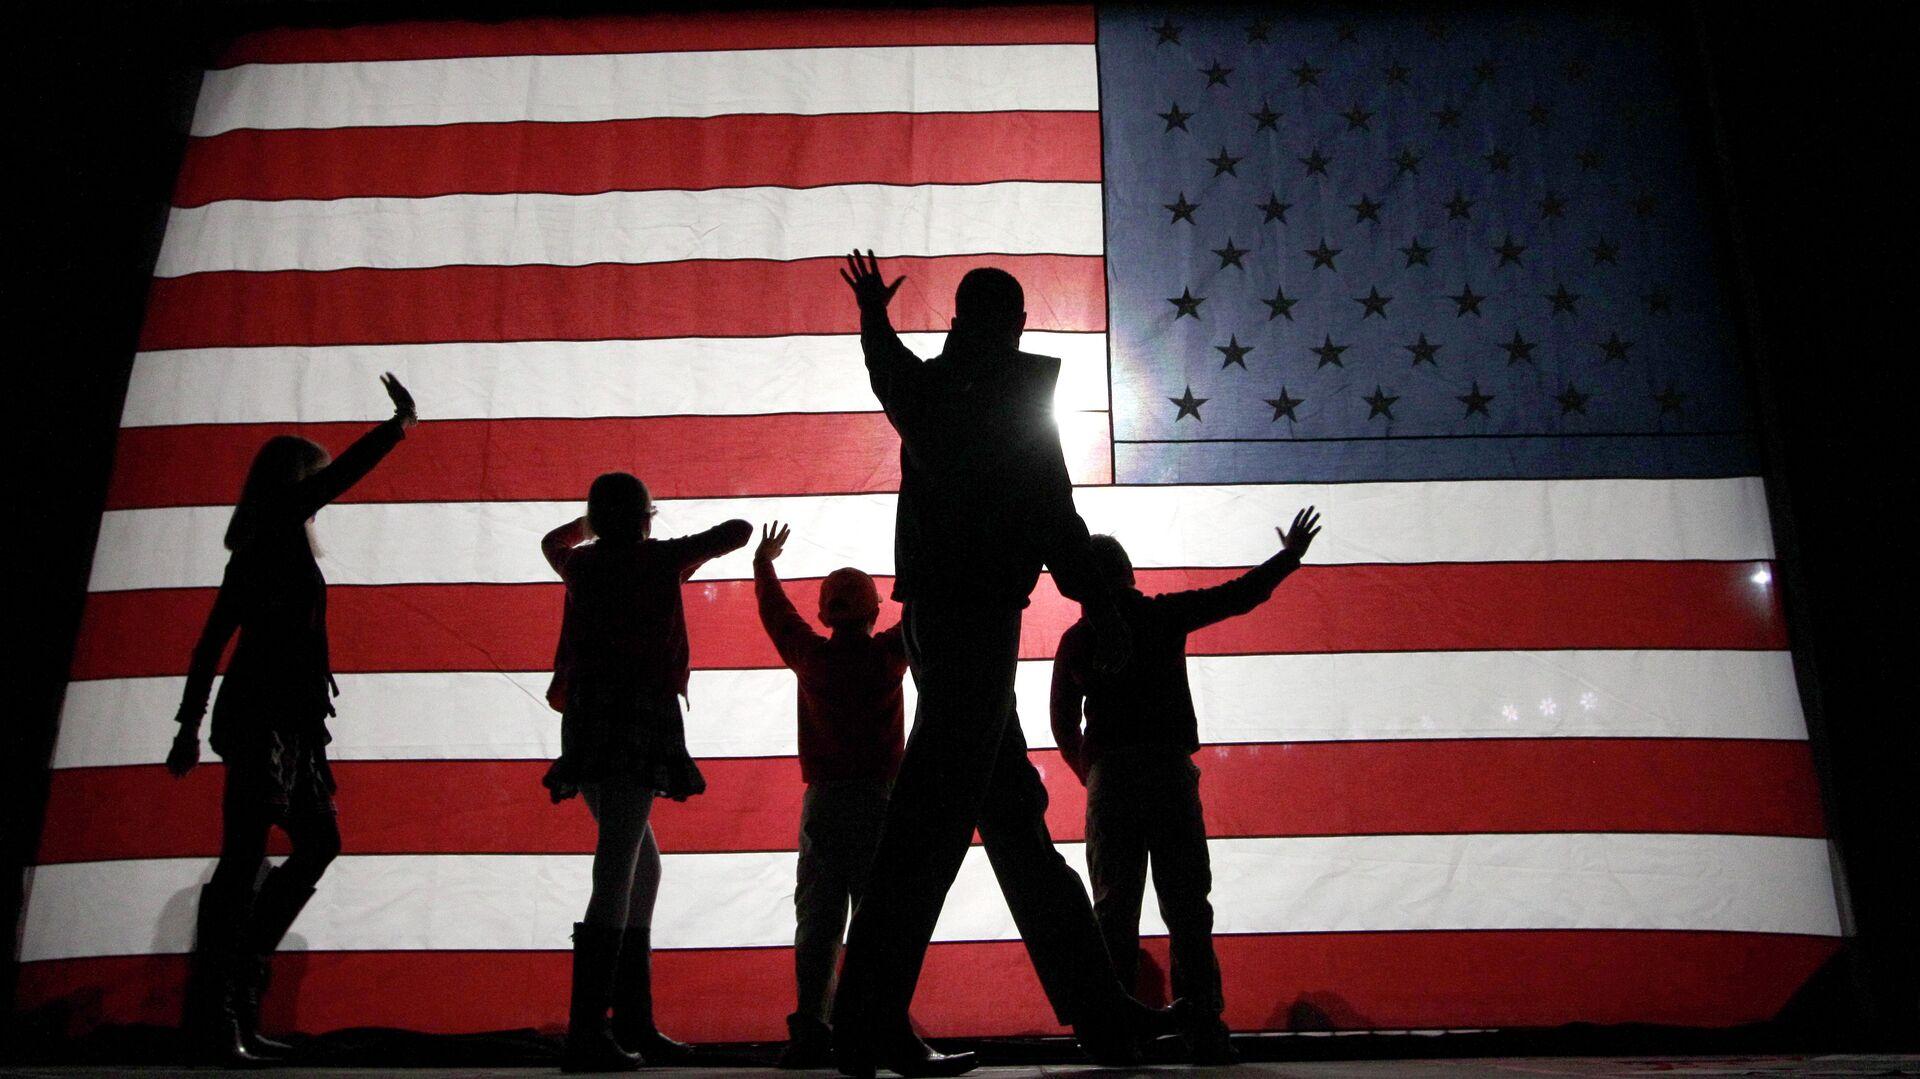 Люди на фоне американского флага - РИА Новости, 1920, 08.12.2020